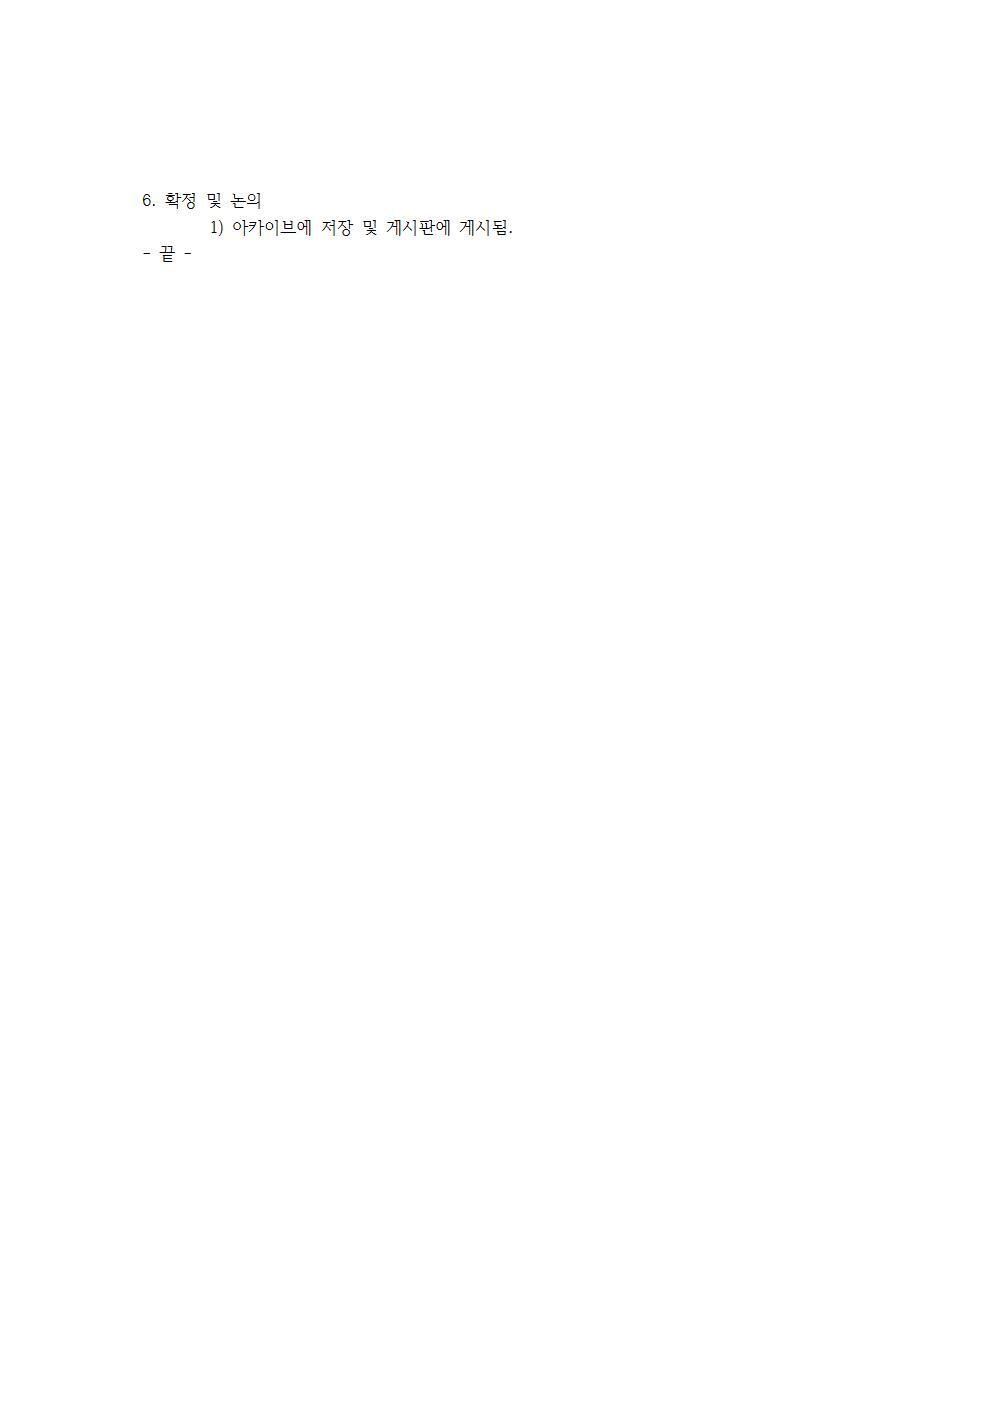 D-[17-005-RD-01]-[SAVE 2.0 ADOxx]-[YB]-[2017-12-16]002.jpg